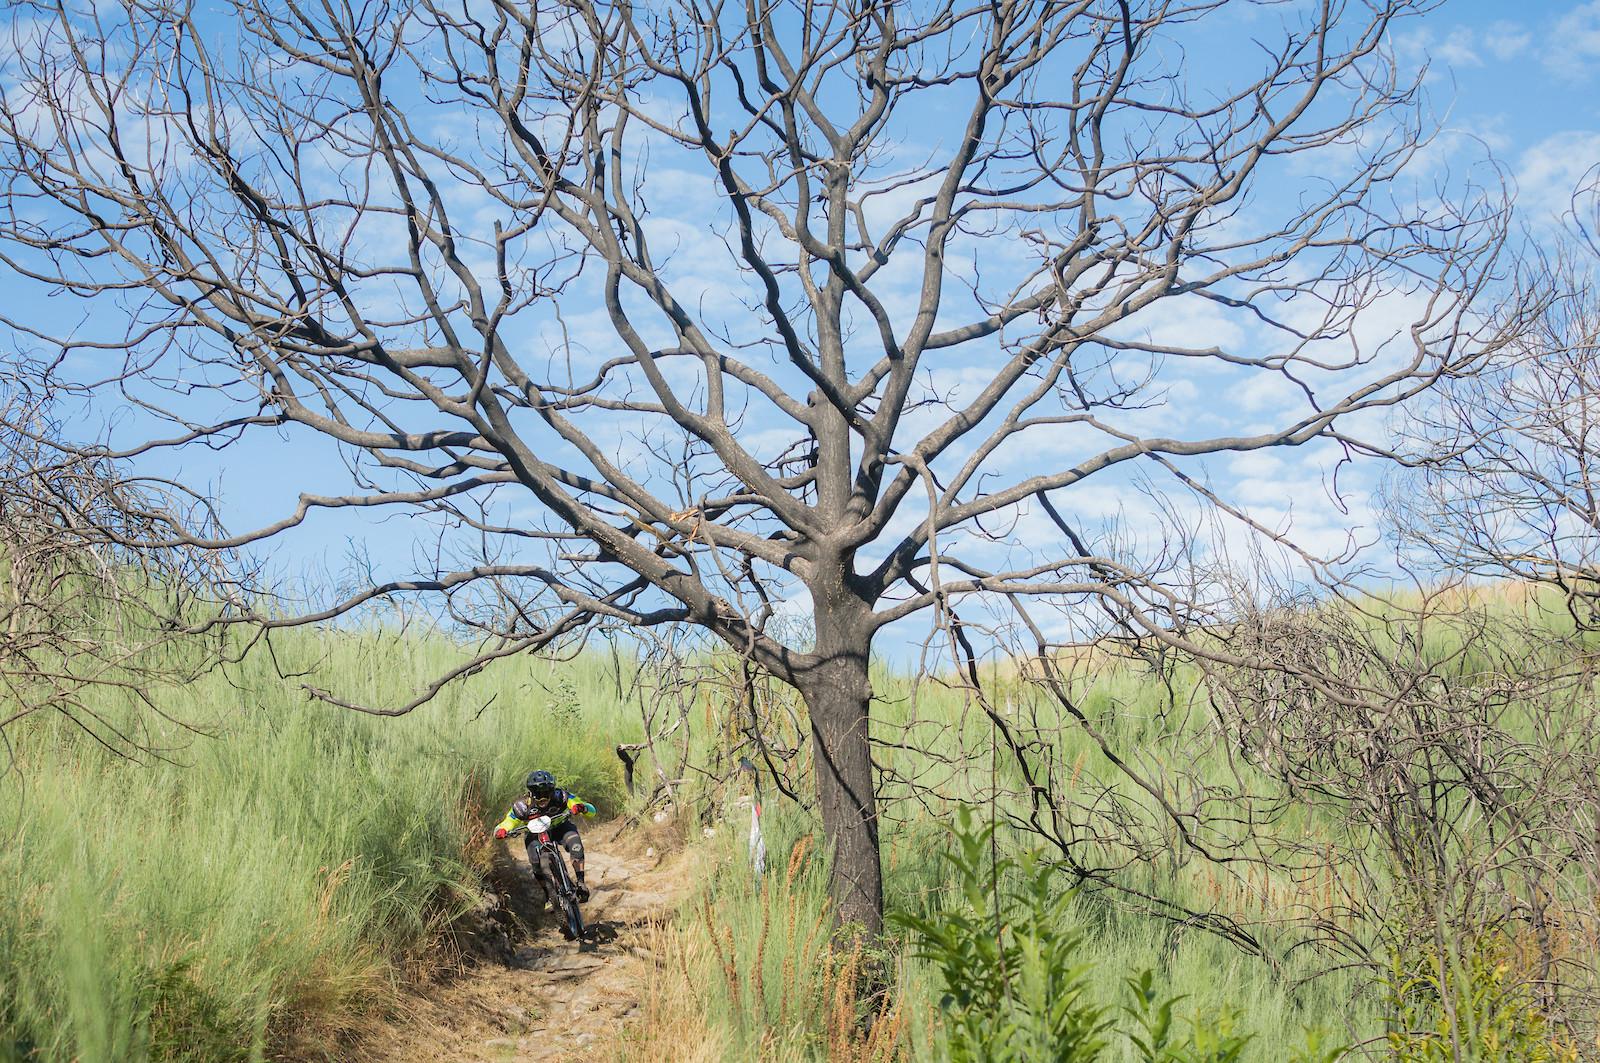 Emanuel Pombo - miguelbento - Mountain Biking Pictures - Vital MTB